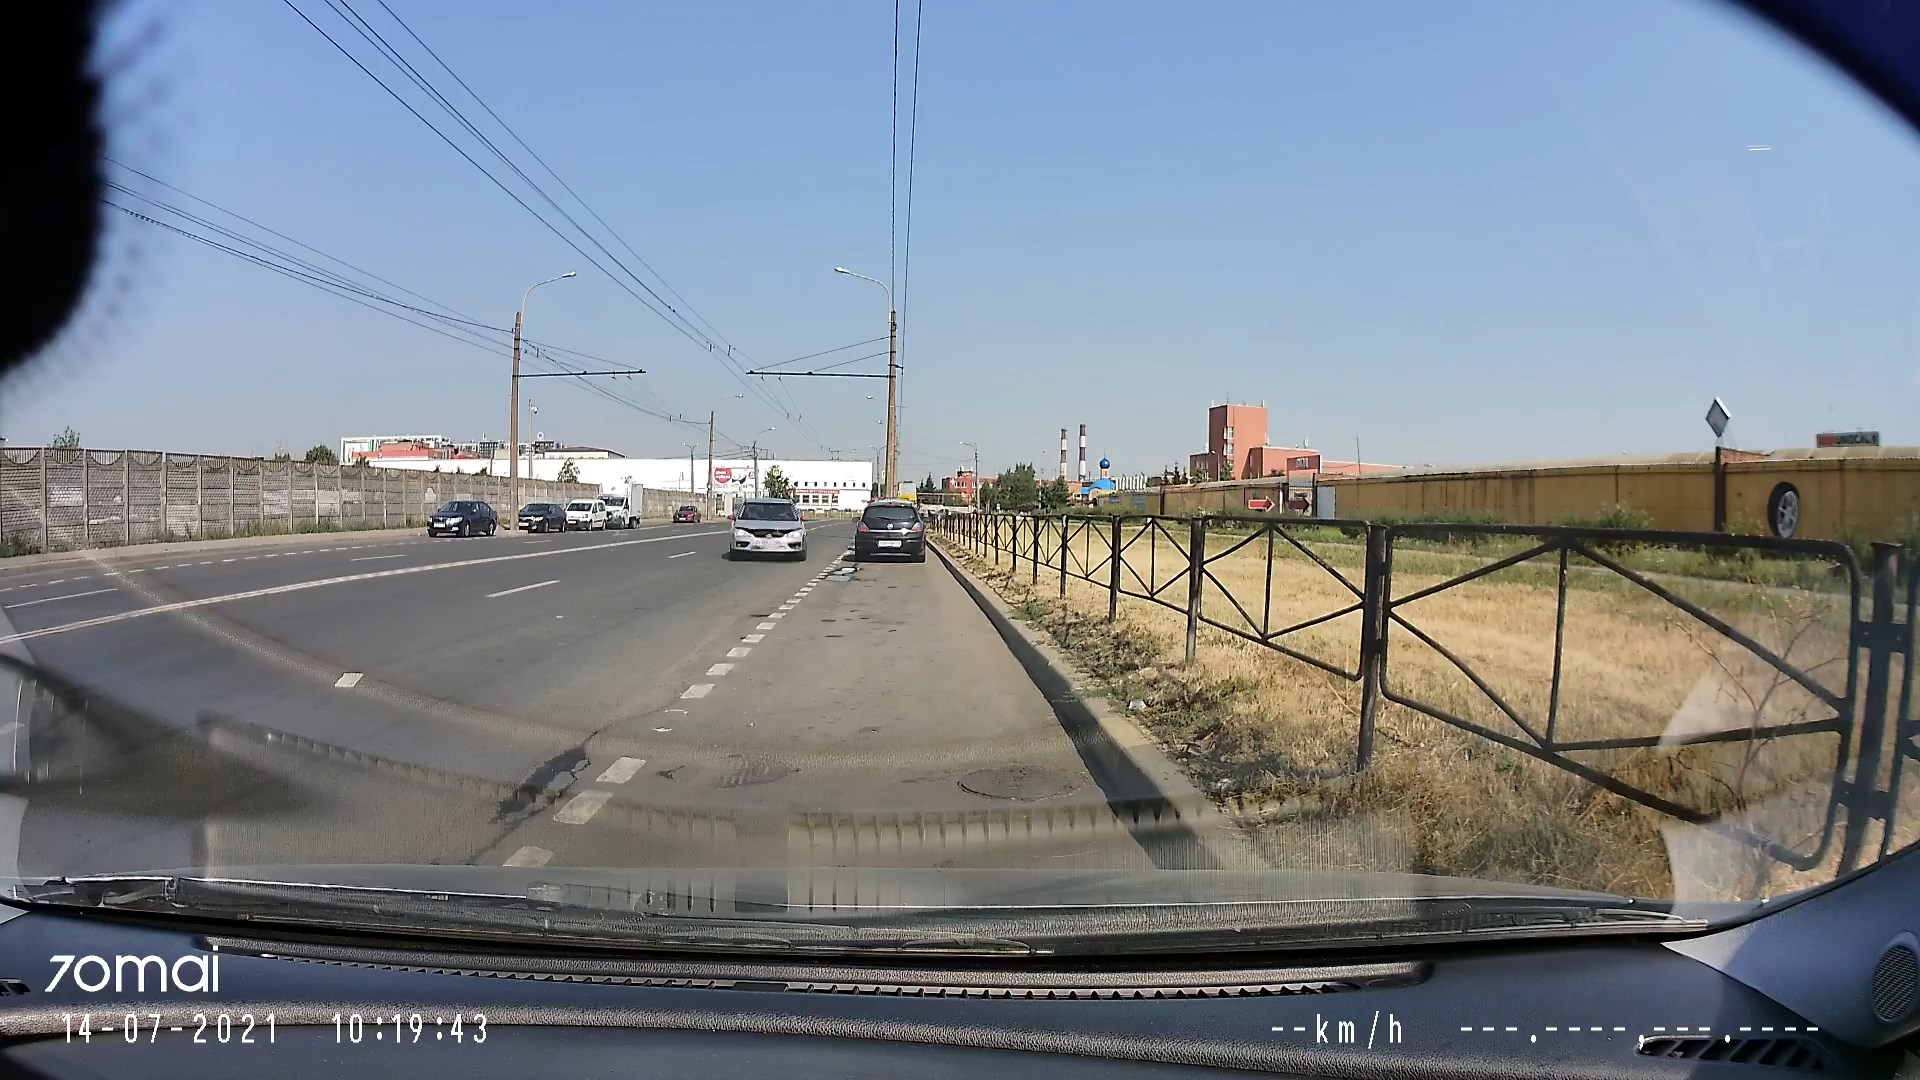 "Скриншот видео из группы <a href=""https://vk.com/wall-94076846_4249339"" class=""io-leave-page _"" target=""_blank"">«Признавашки ДТП и ЧП Санкт-Петербург»</a>"